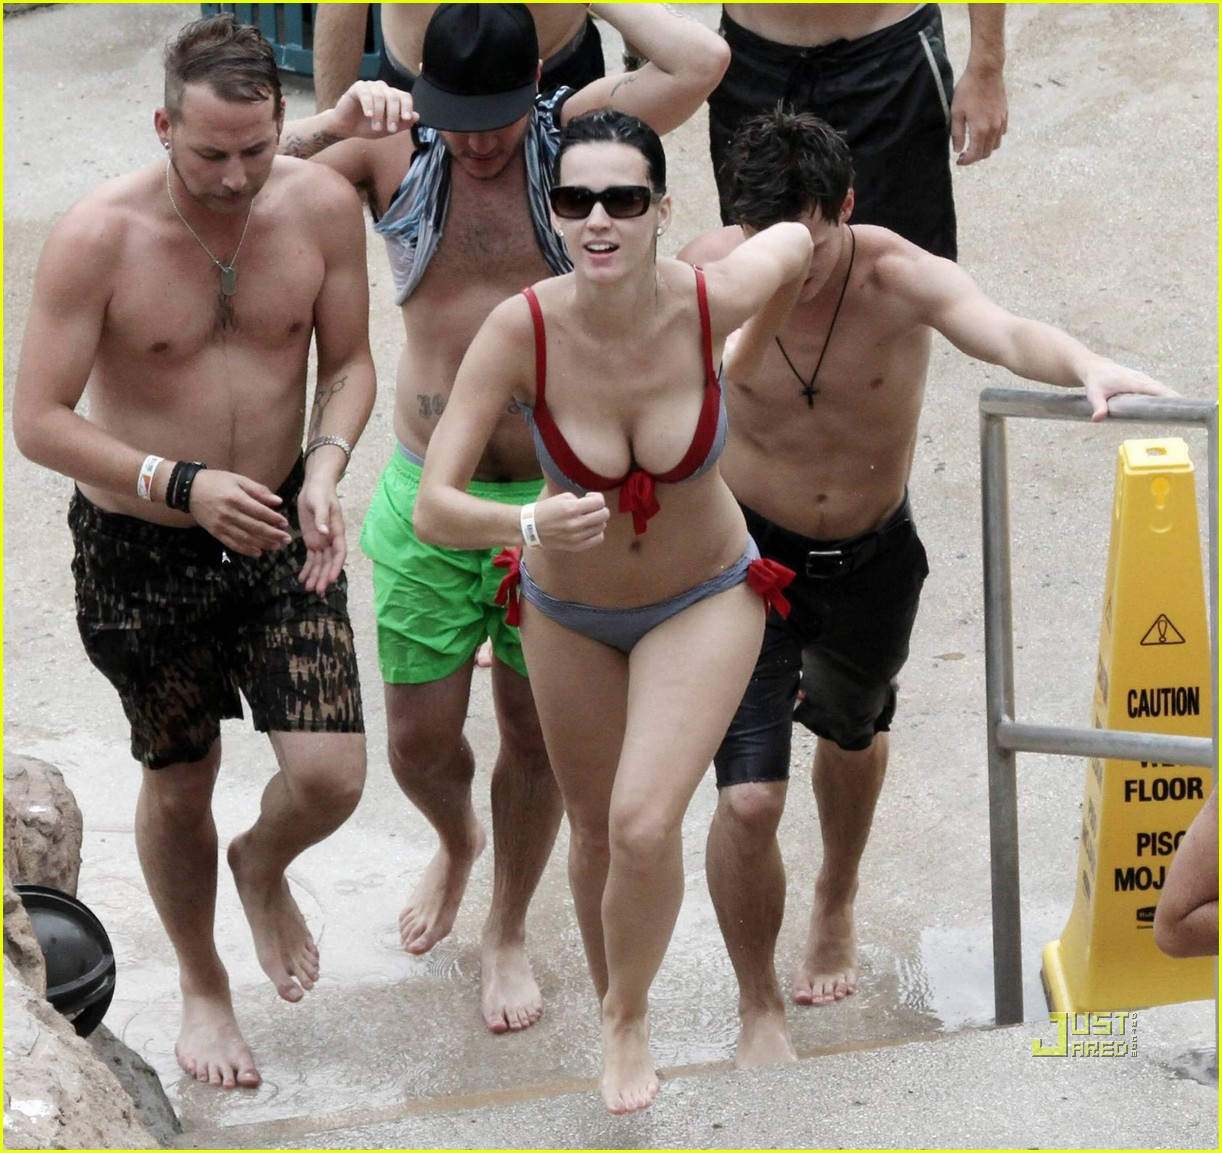 katy perry bikini bahamas 12 Hidden cam. October 11th, 2010 by admin No comments »